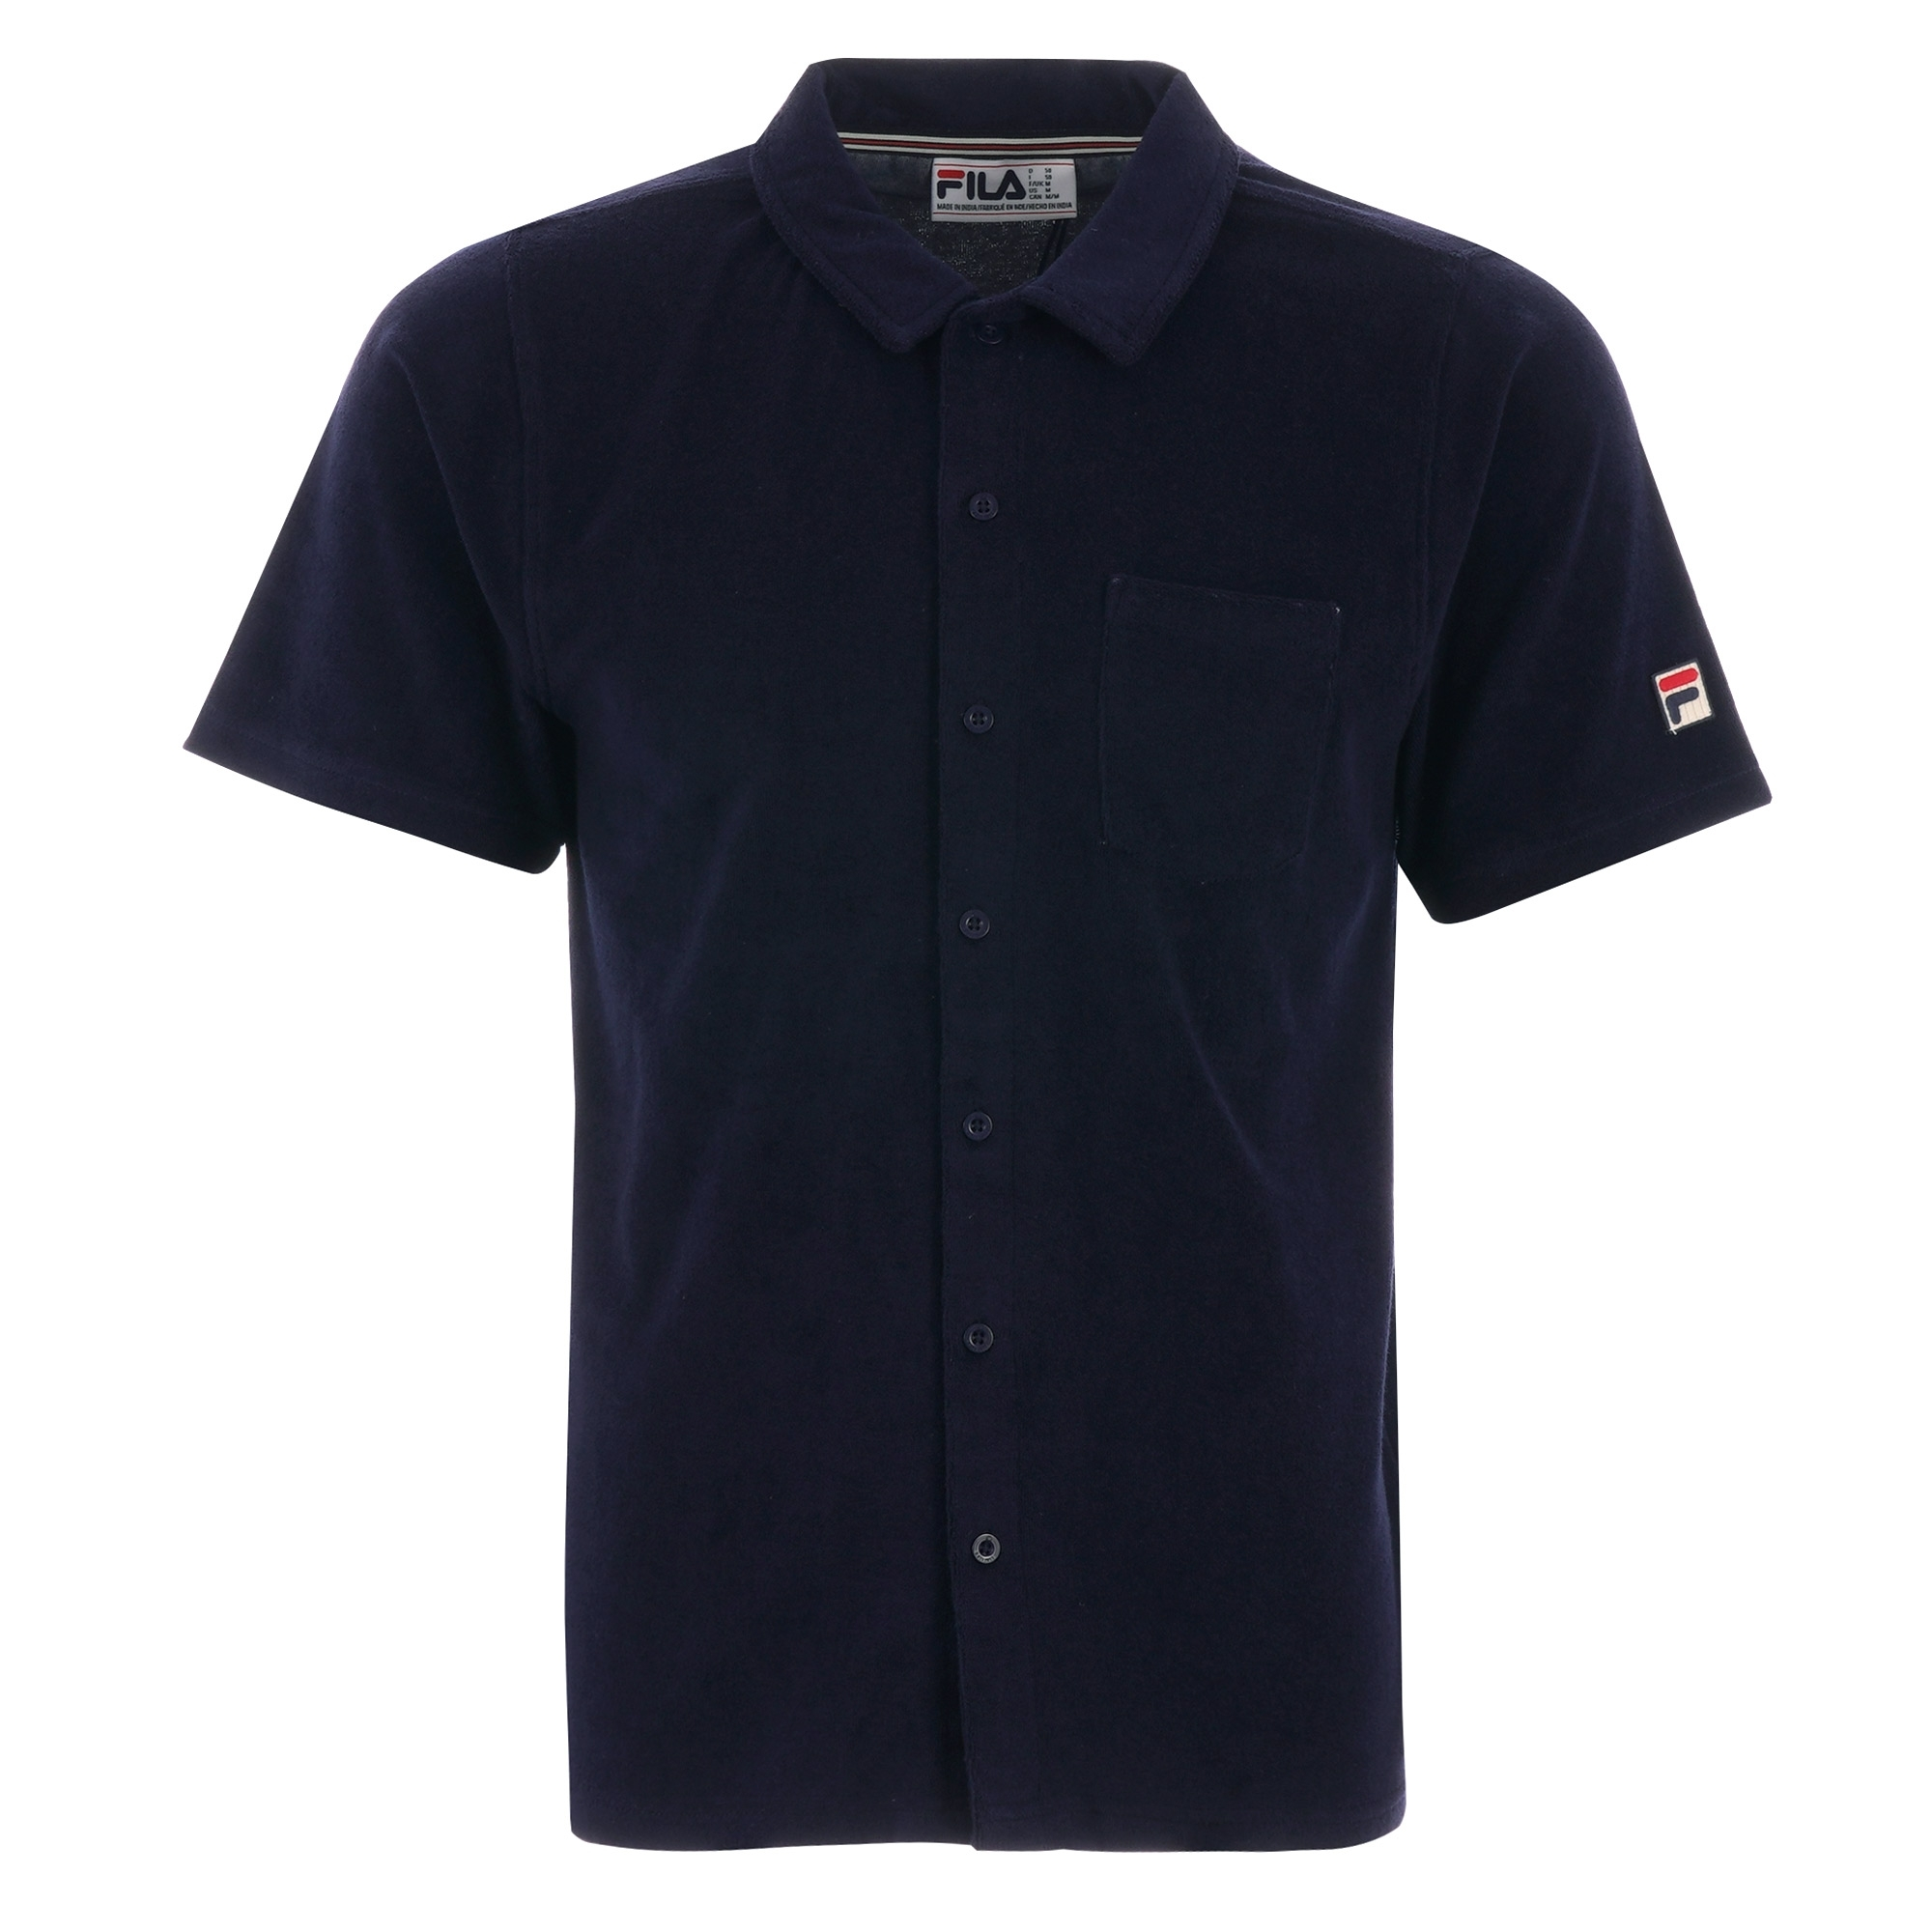 d1e03e51b Fila Vintage Polo Shirt In Towelling | Top Mode Depot